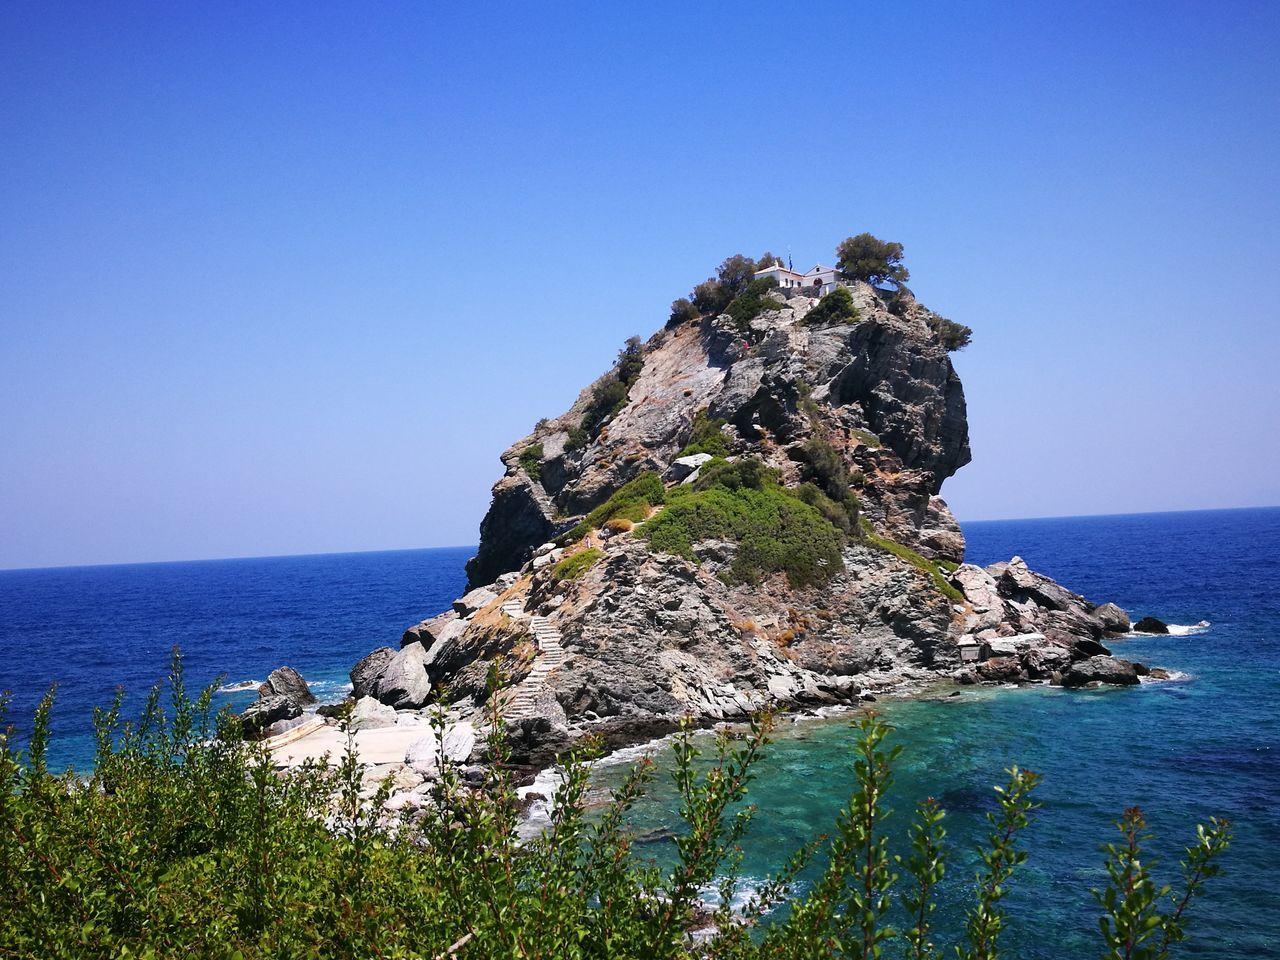 Mamma Mia Church Skopelos Greek Island Greek Islands Greek Summer Sea View Sea And Mountain Sea And Rocks Sporades Greece Summer2016